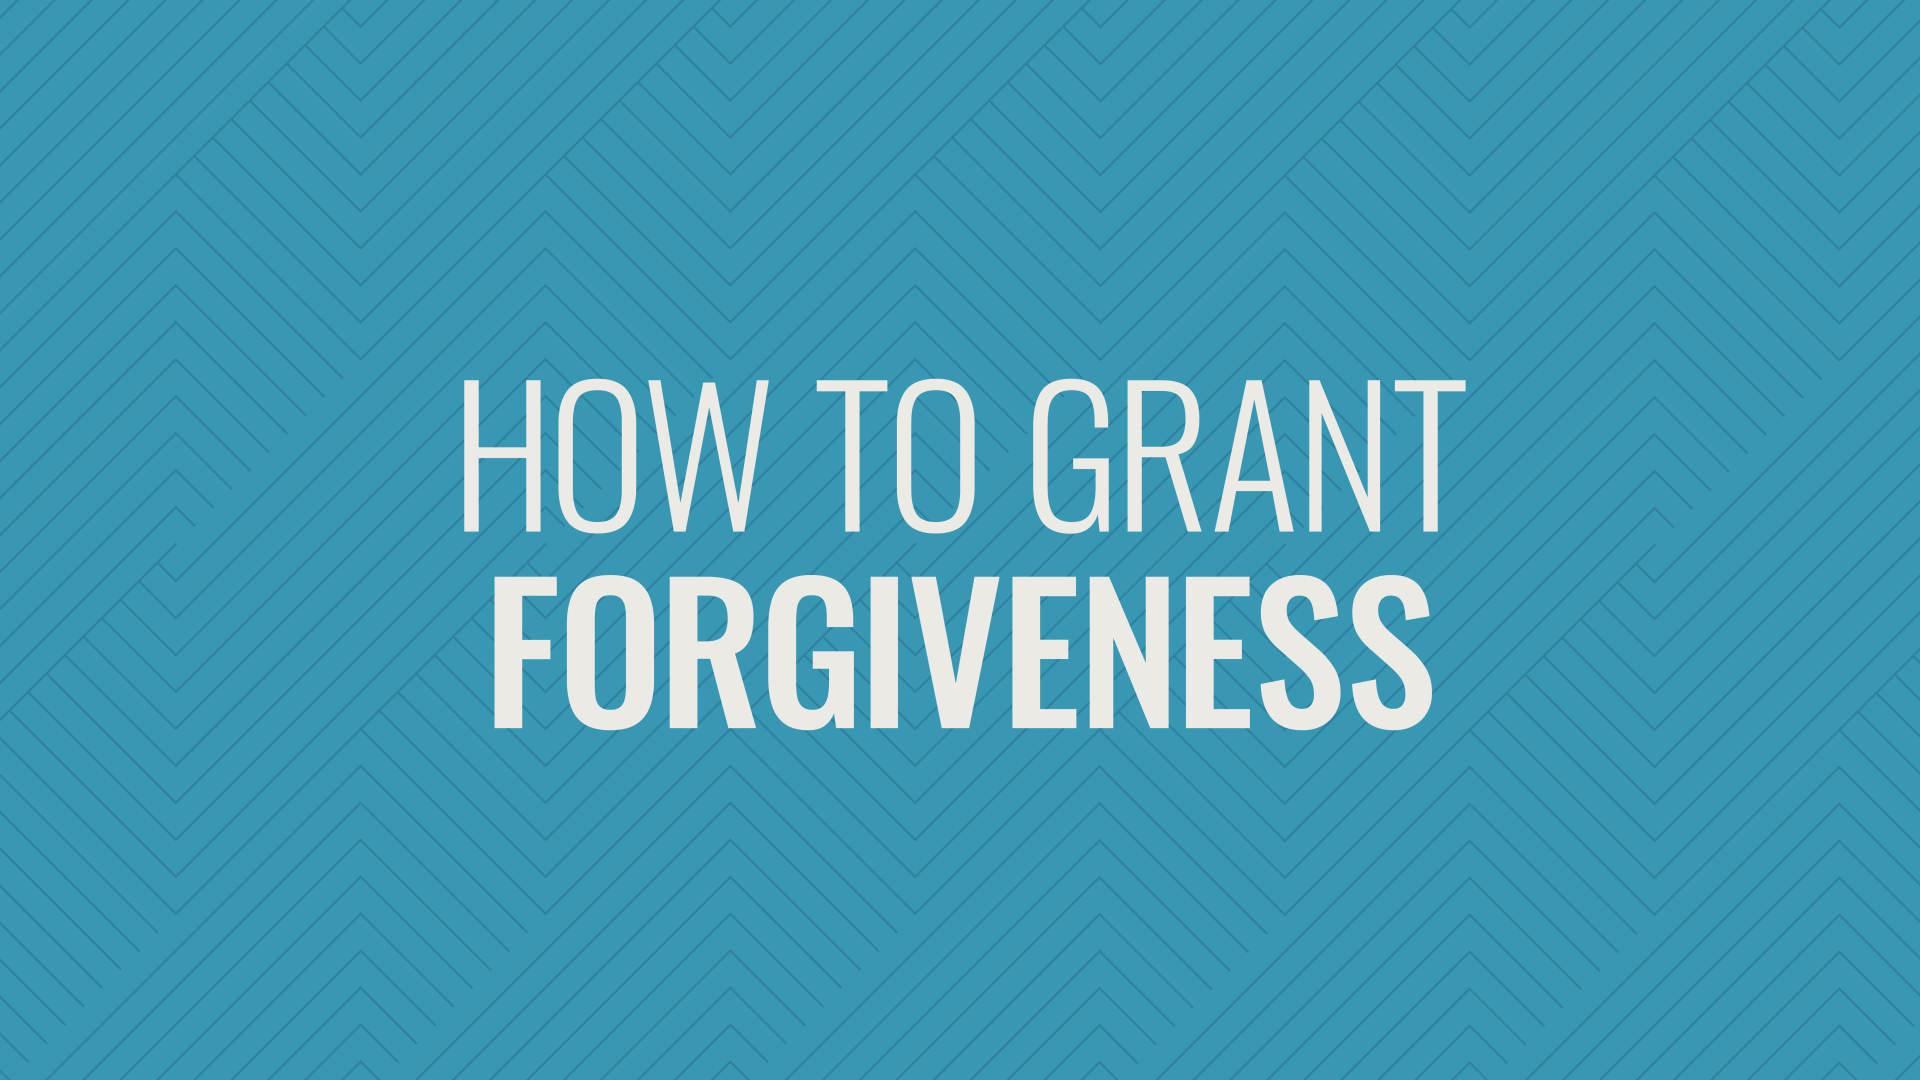 How to Grant Forgiveness Hero Image